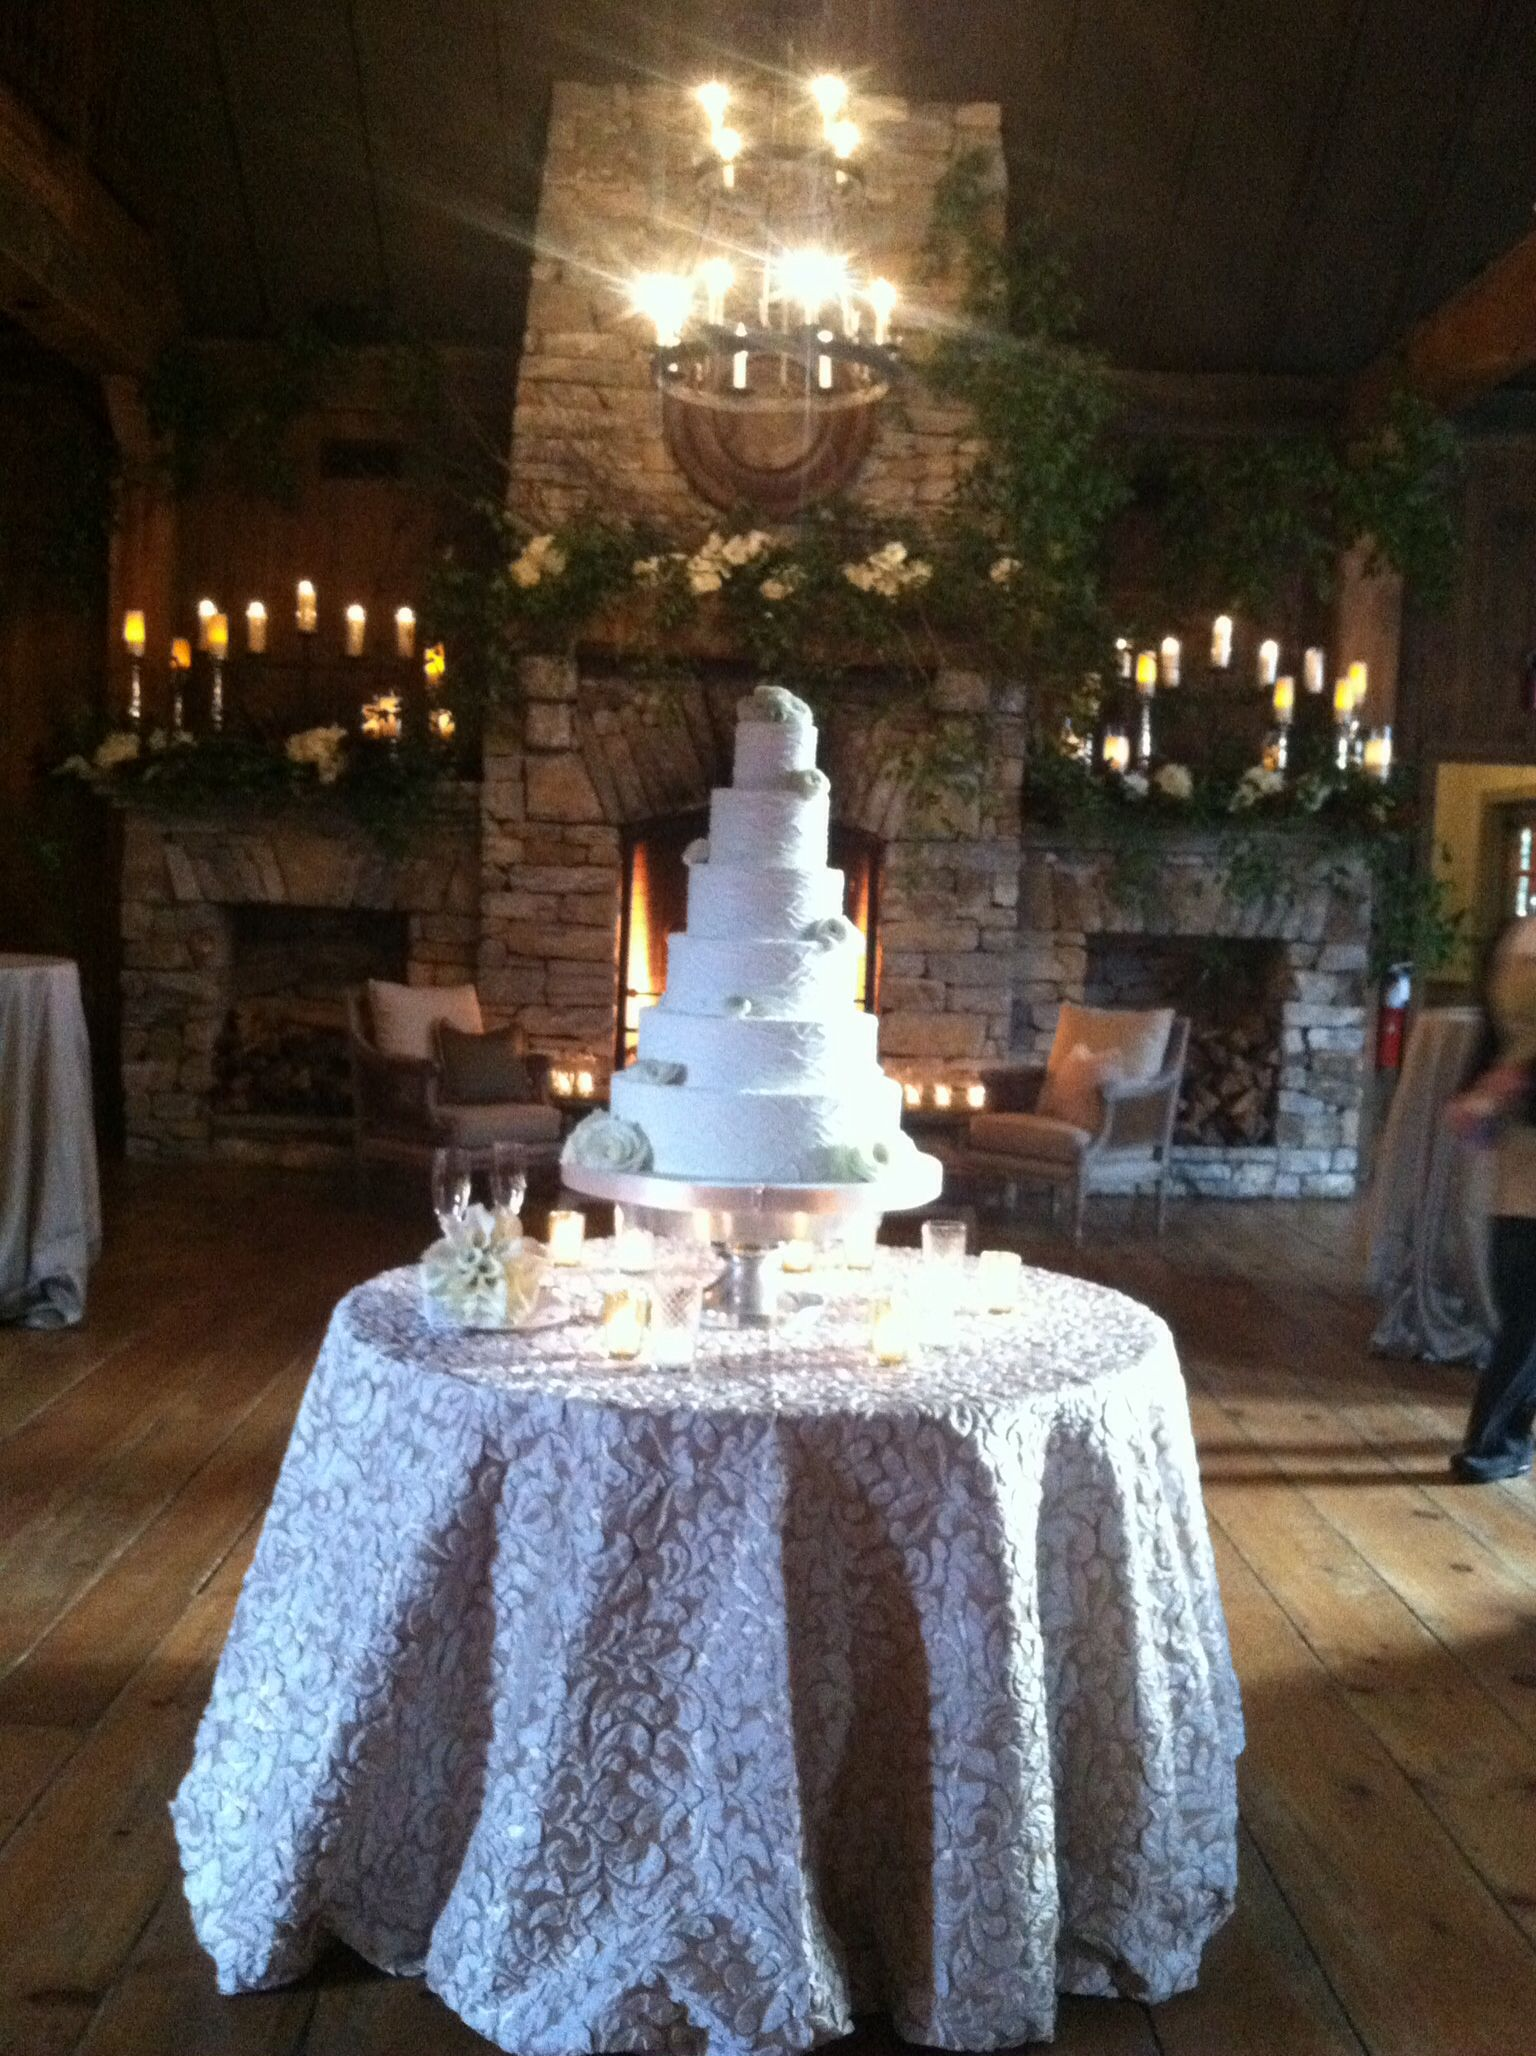 oldedwardsinn weddings Birthday candles, Candles, Old